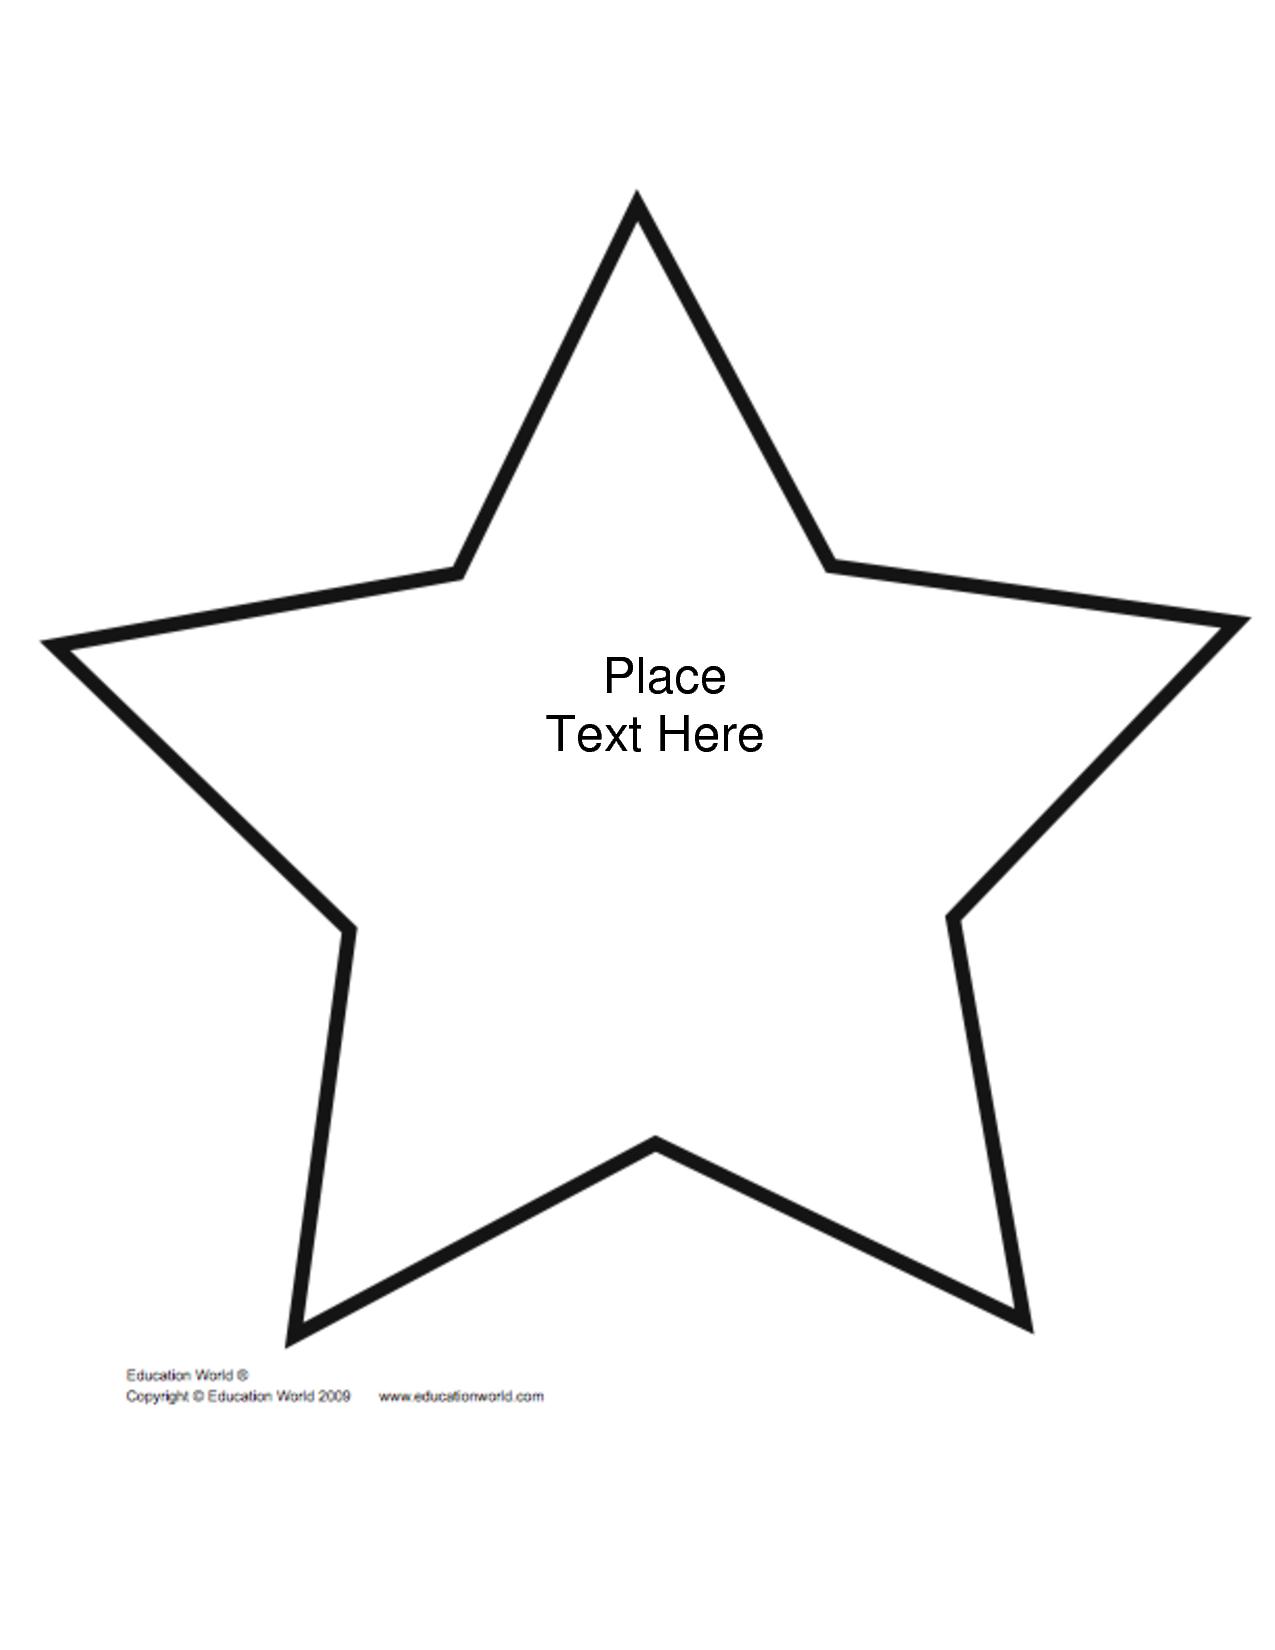 Free+Printable+Star+Shape+Templates | Biblical Preschool Lessons - Star Of David Template Free Printable